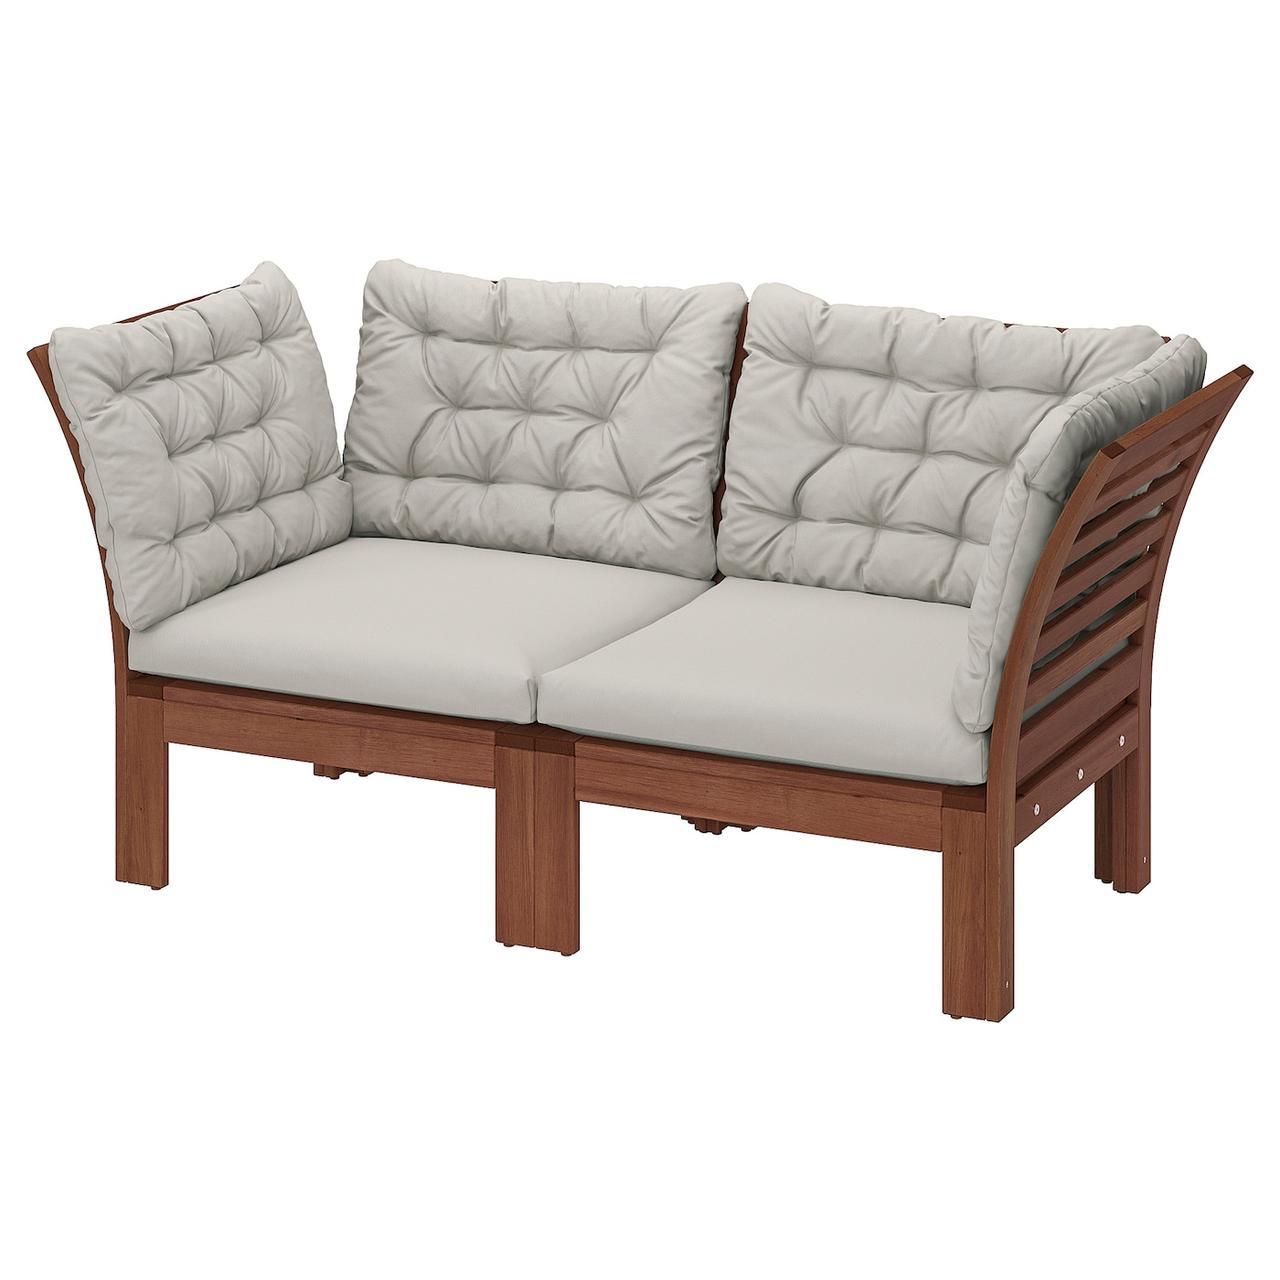 IKEA ÄPPLARÖ Модульний 2-місний диван, дачний, коричнева морилка / Куддарна сірий (293.037.23)